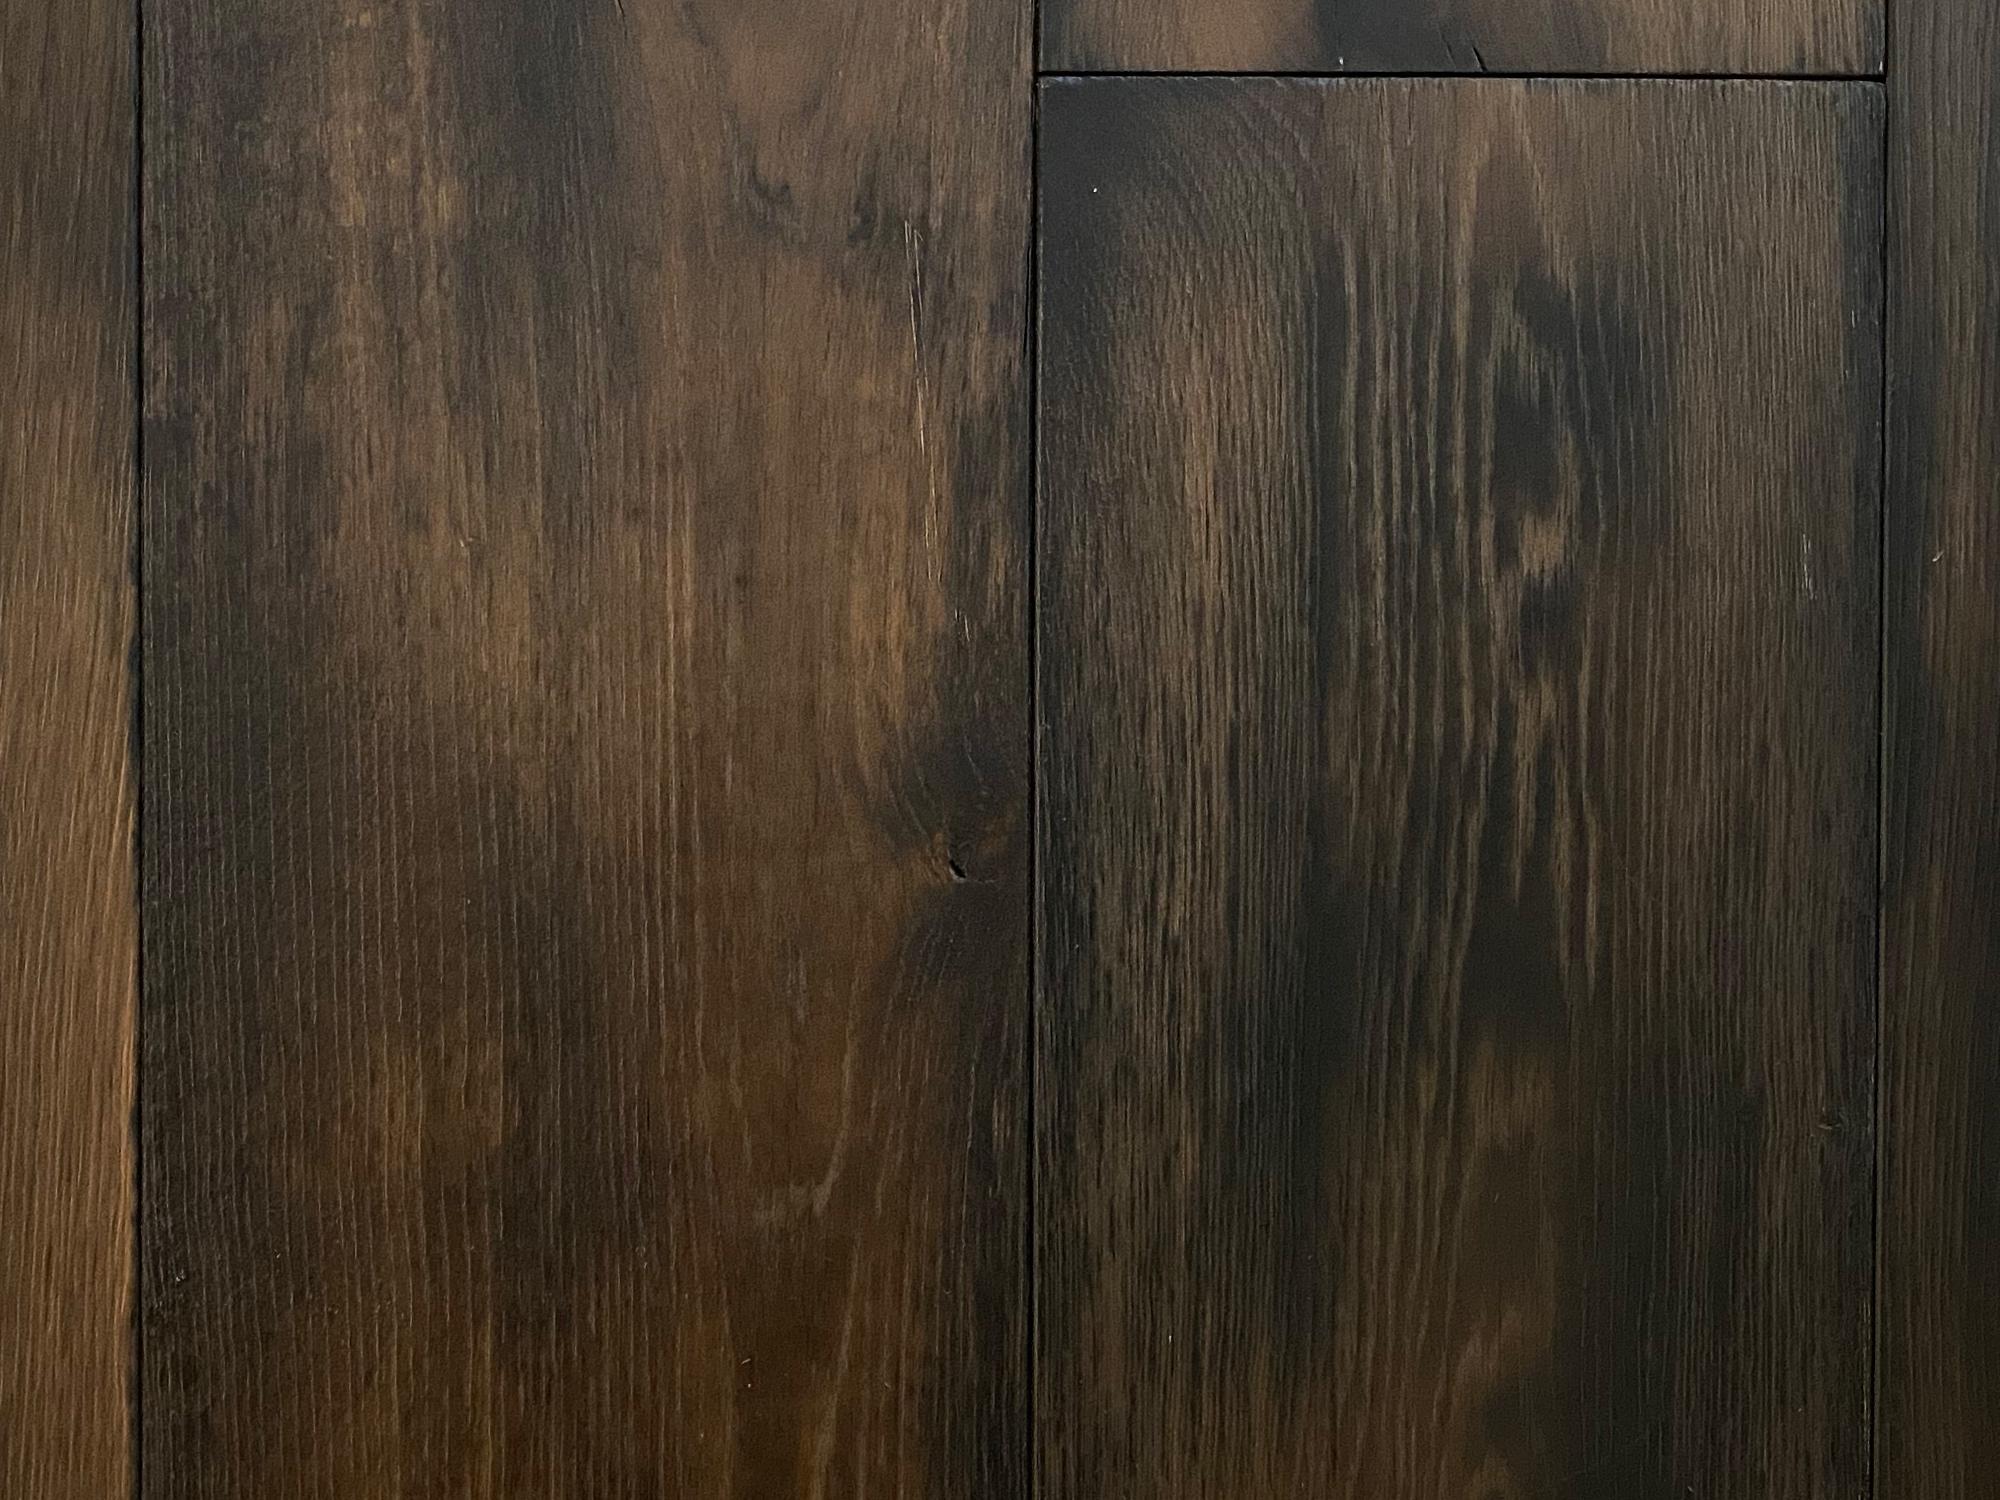 ENG21 dark engineered oak flooring